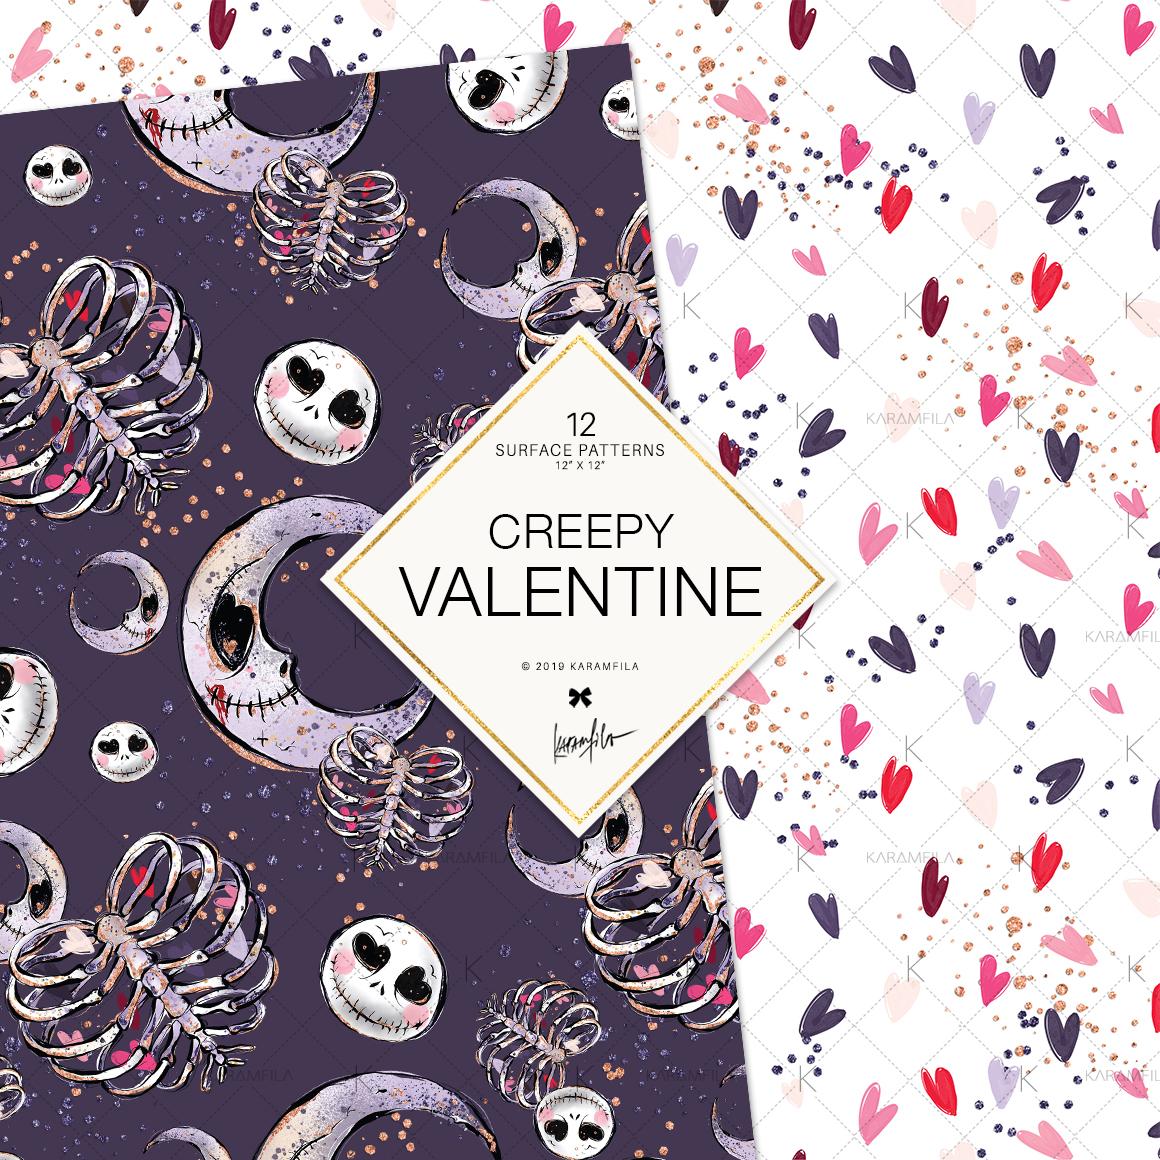 Creepy Valentine's Day Patterns example image 4